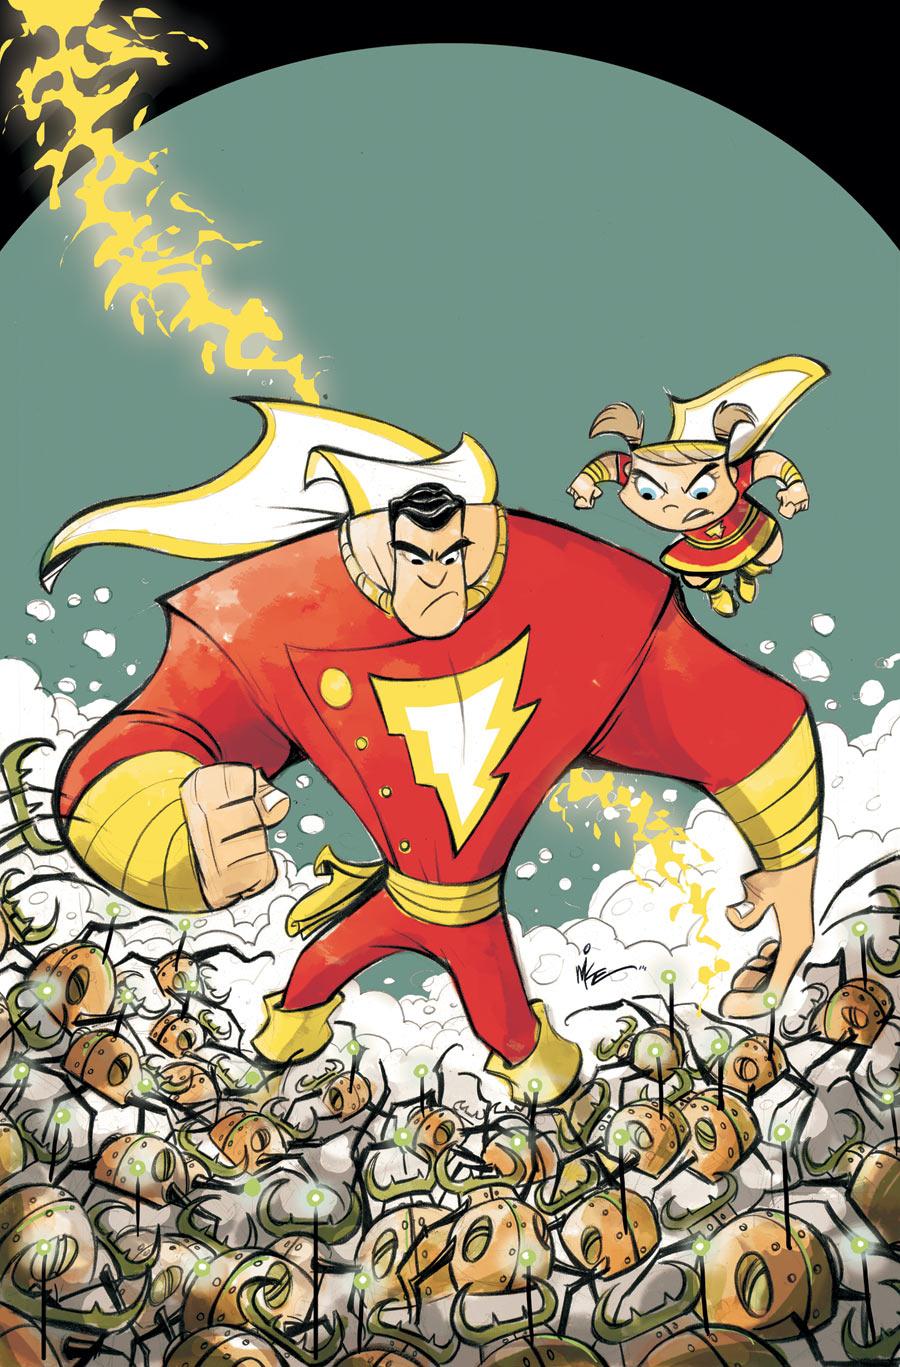 Billy Batson (Magic of Shazam)